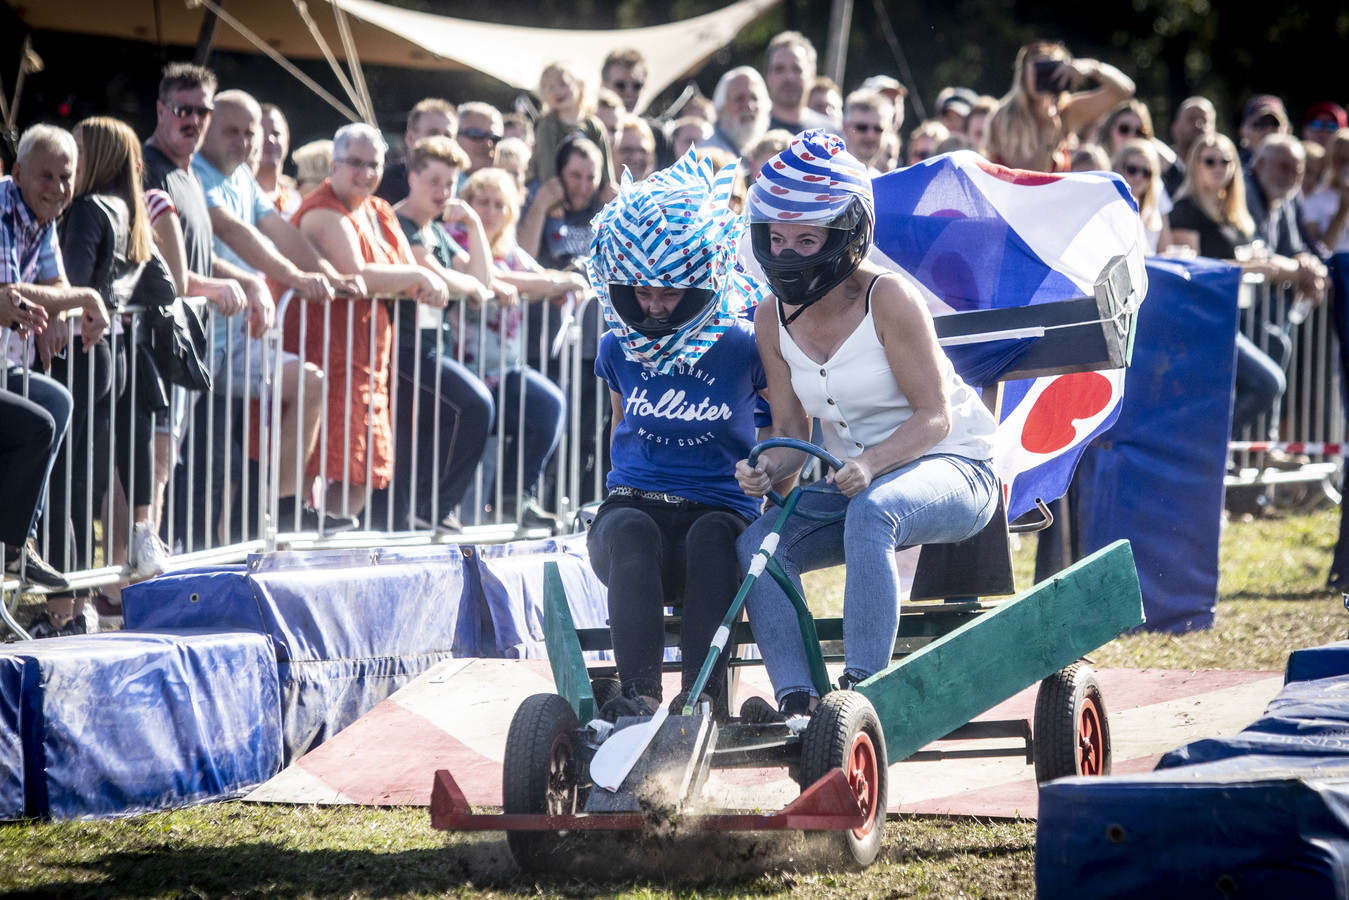 De Friese deelname kwam deze zaterdagmiddag uit Oudega.